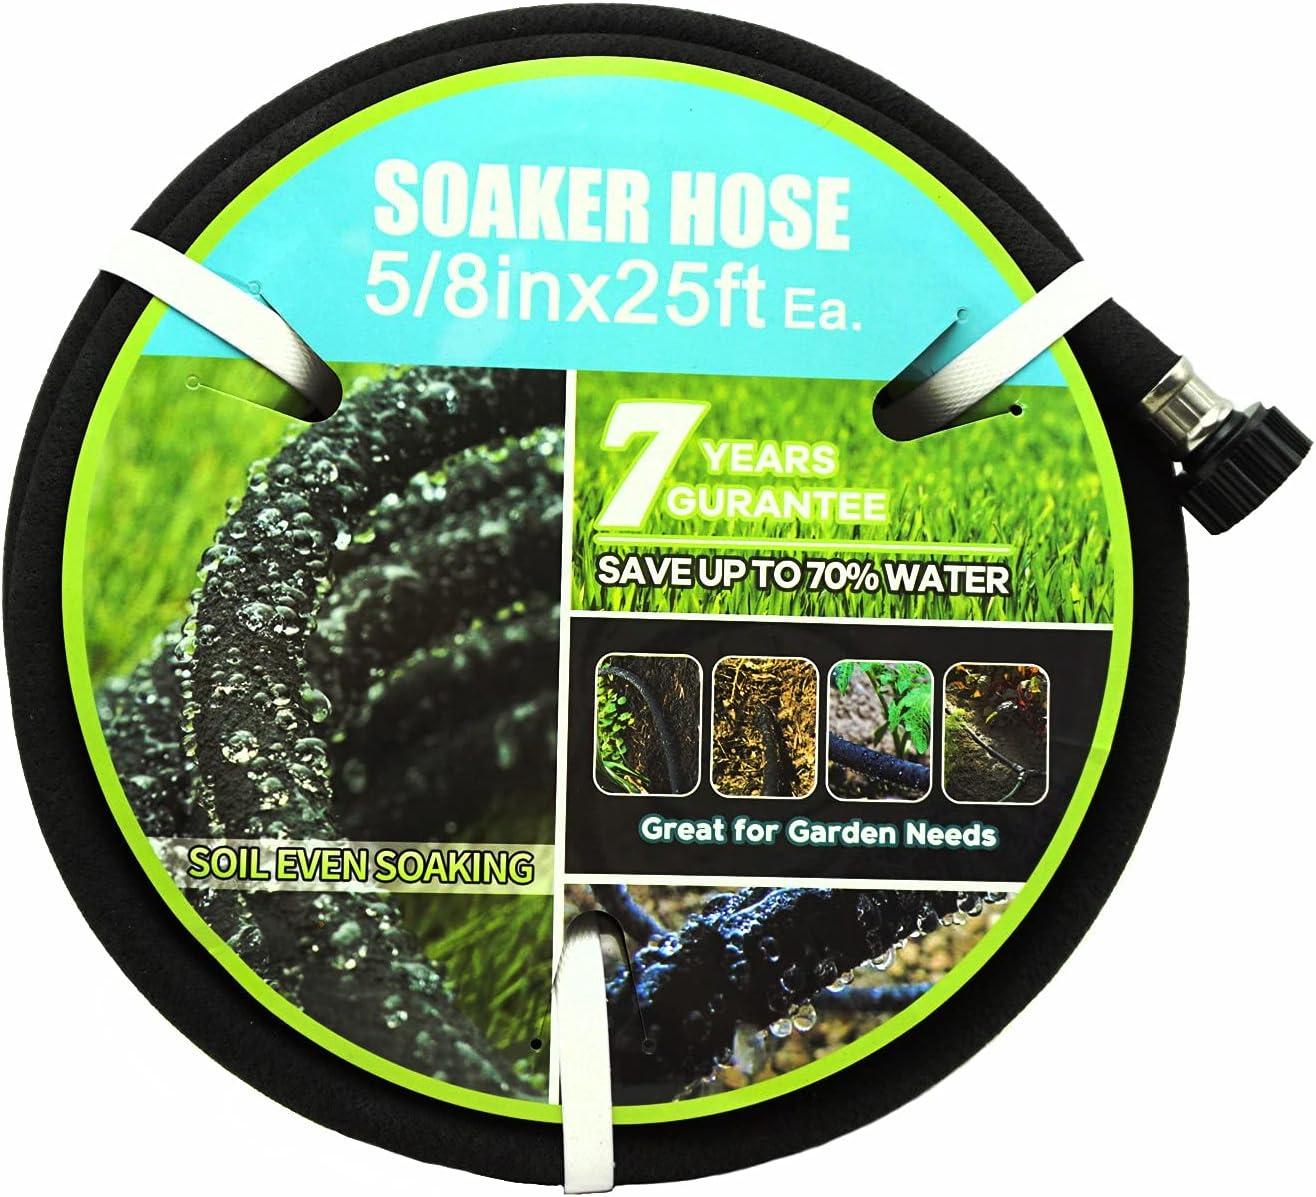 Meifeng Soaker Hose 5/8 inch Diameter 25 foot Black Garden Water Hose Flower Beds and Lawns Lightweight Porous 5/8in25ft Hose